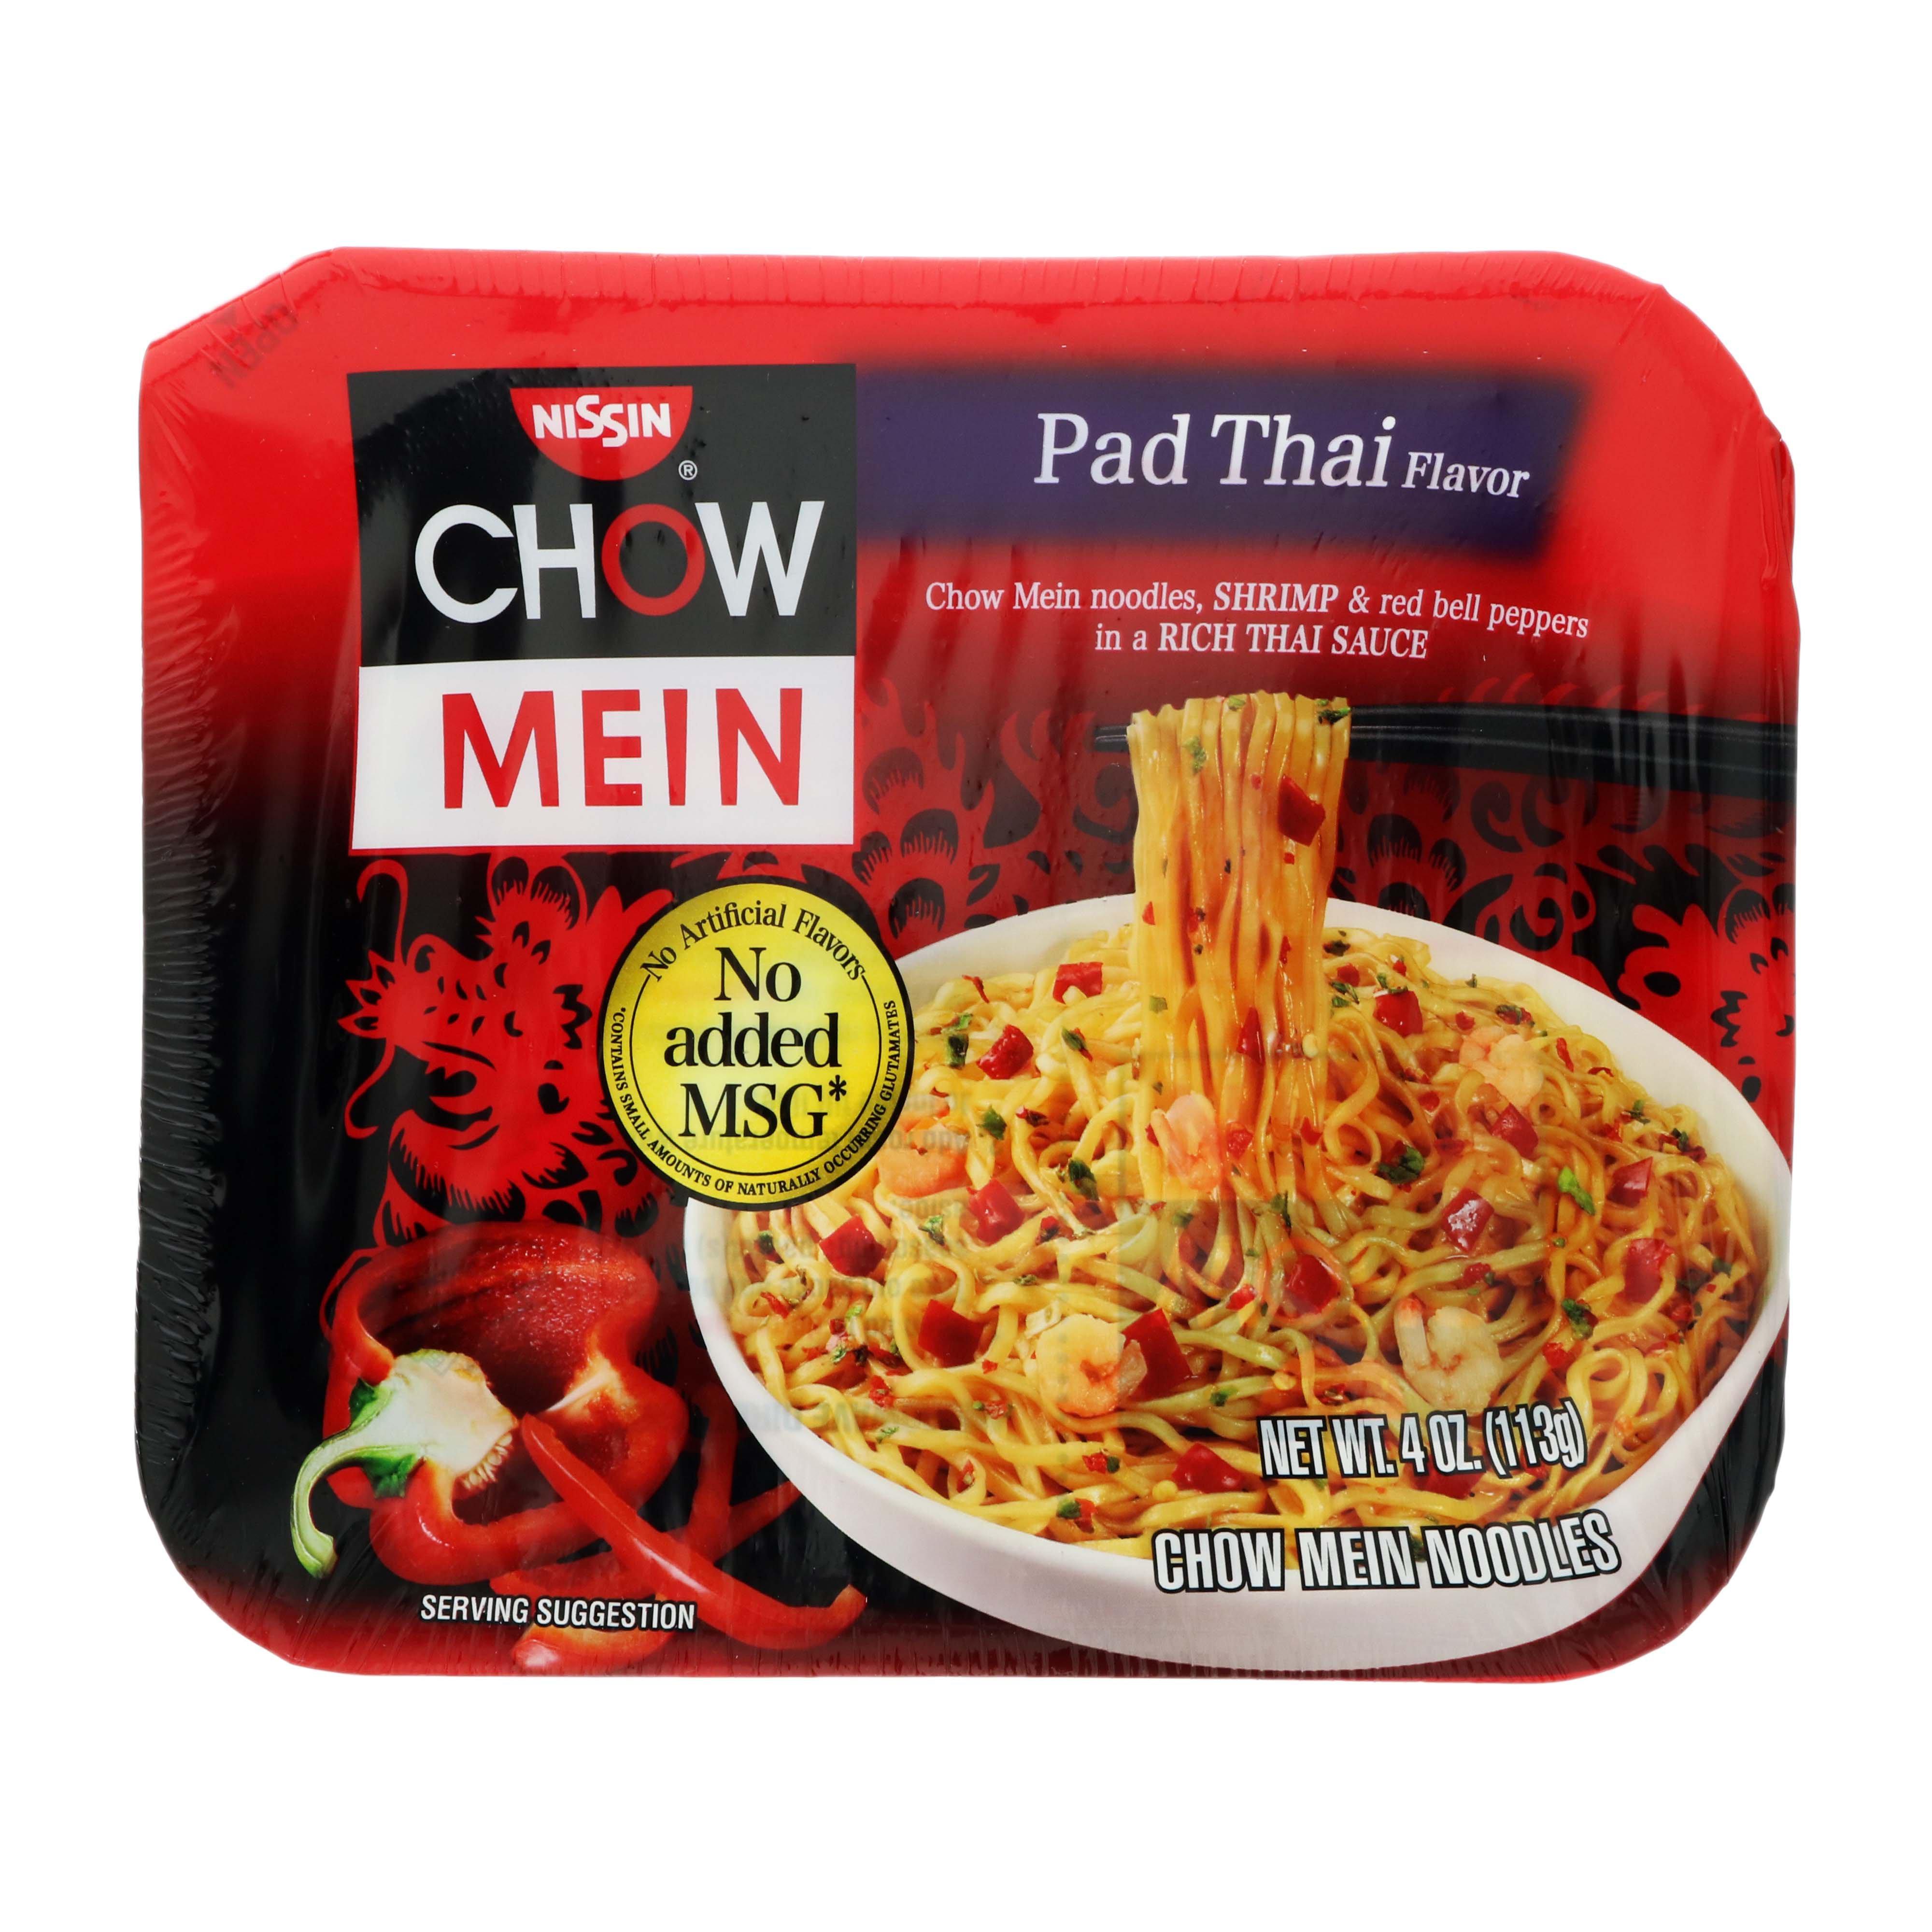 Nissin Chow Mein Pad Thai Flavor Noodles Shop Pantry Meals At H E B